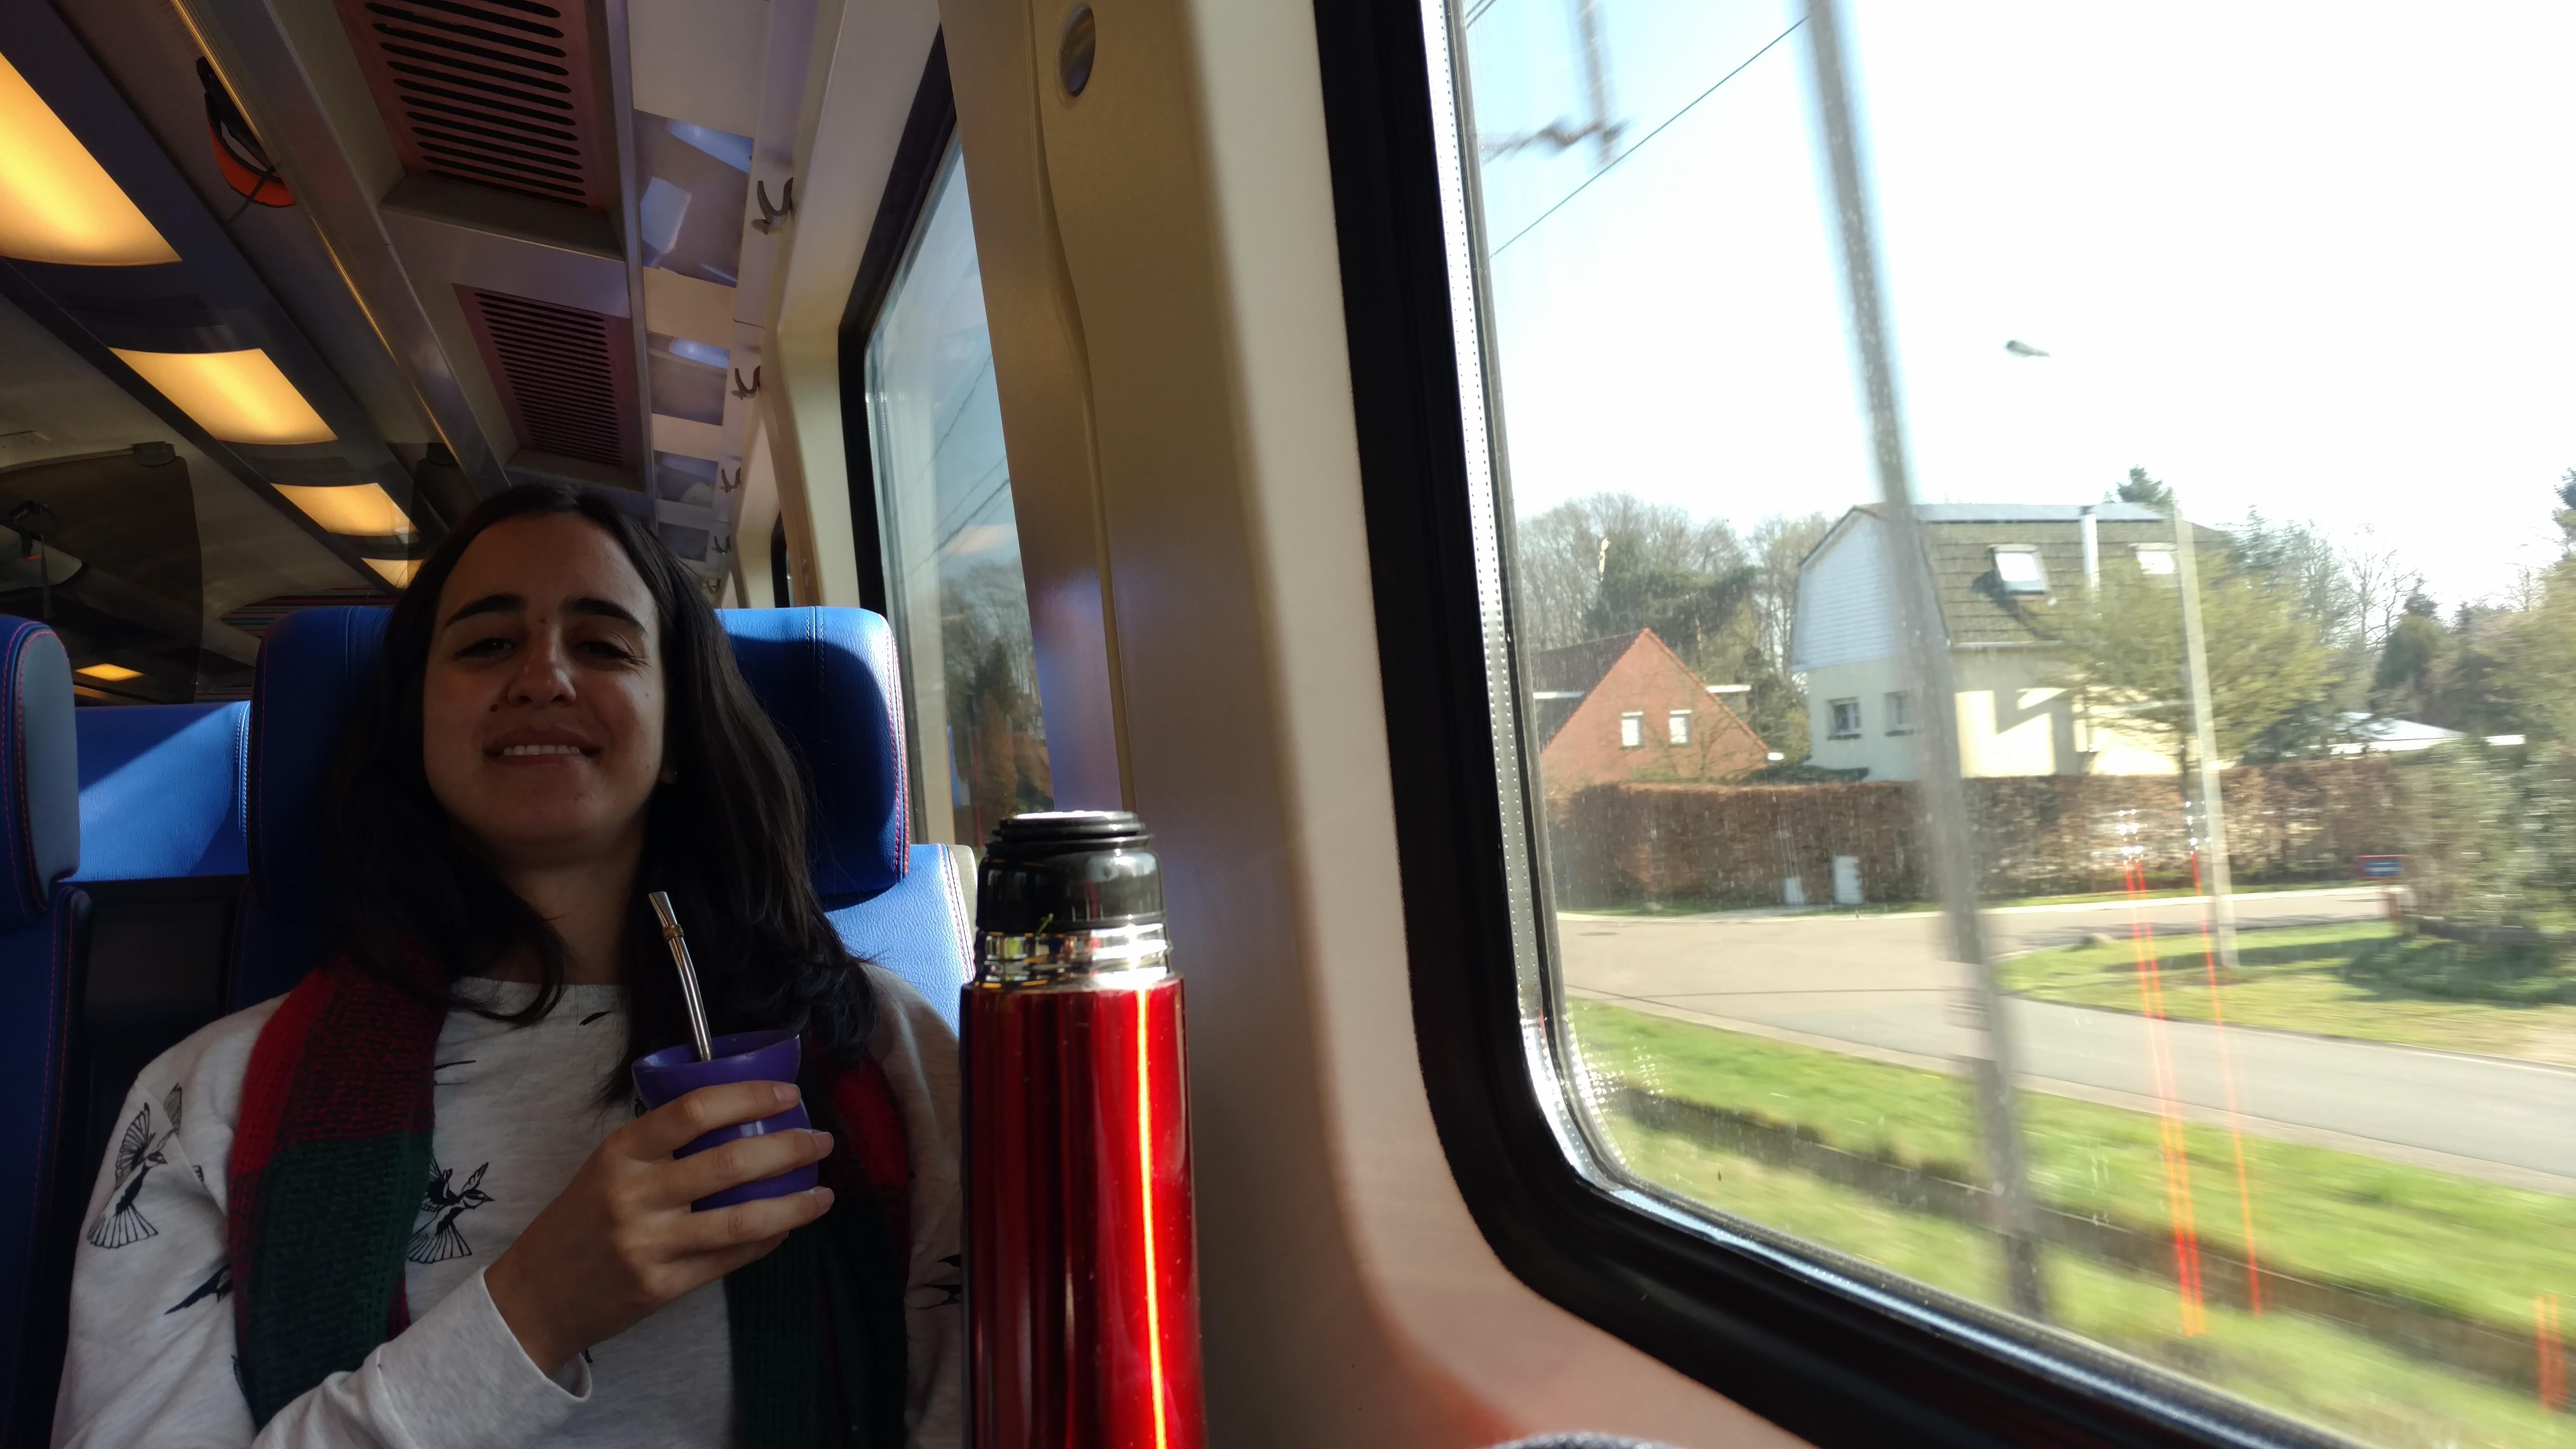 Tomando mate en el tren